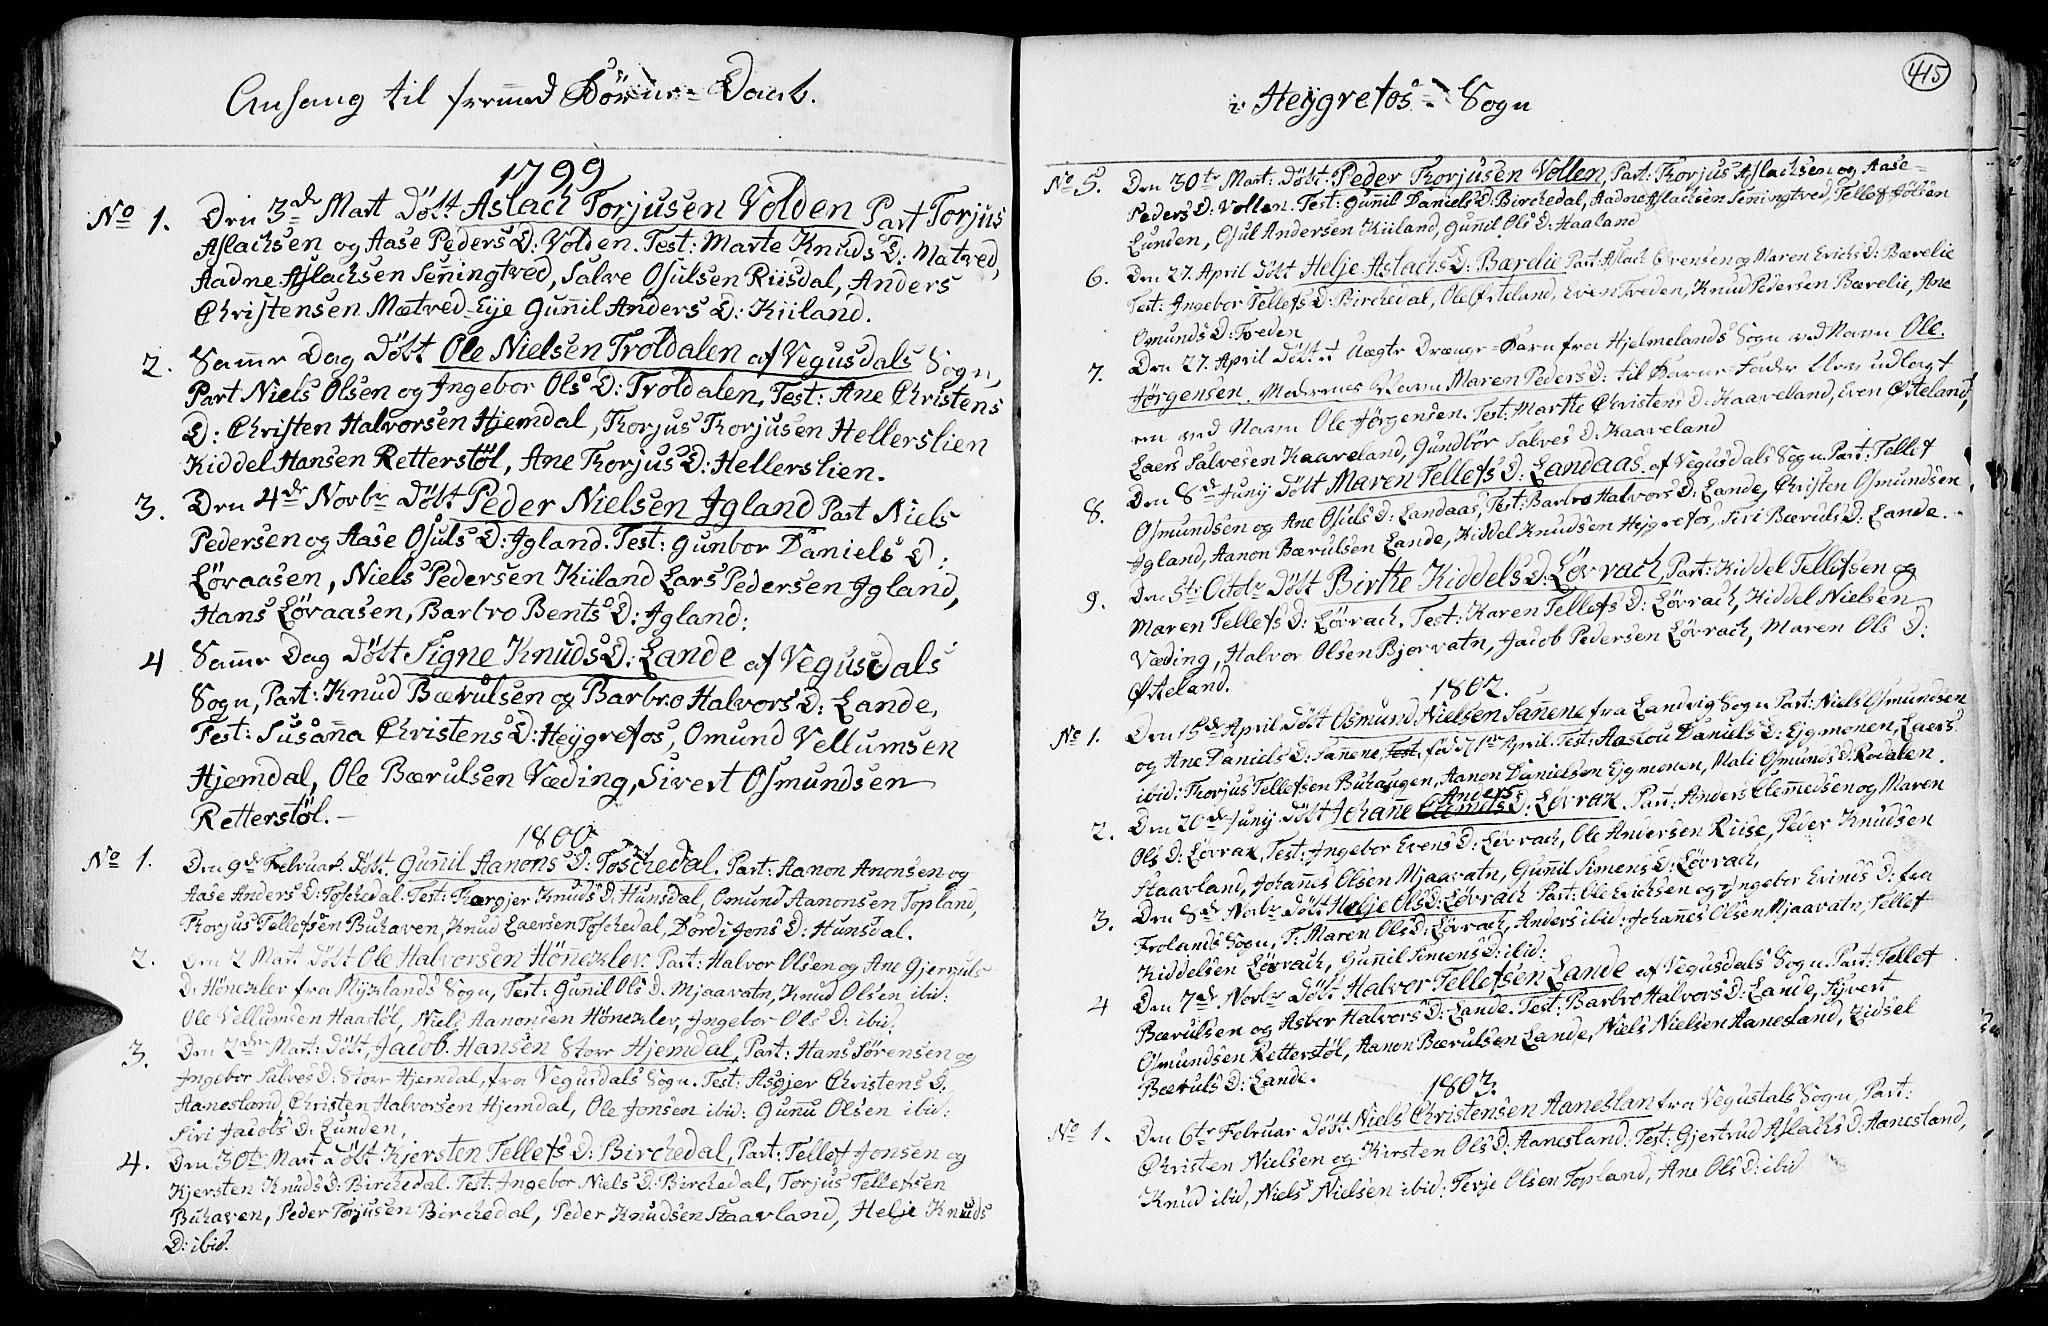 SAK, Hommedal sokneprestkontor, F/Fa/Fab/L0002: Ministerialbok nr. A 2 /3, 1740-1821, s. 415